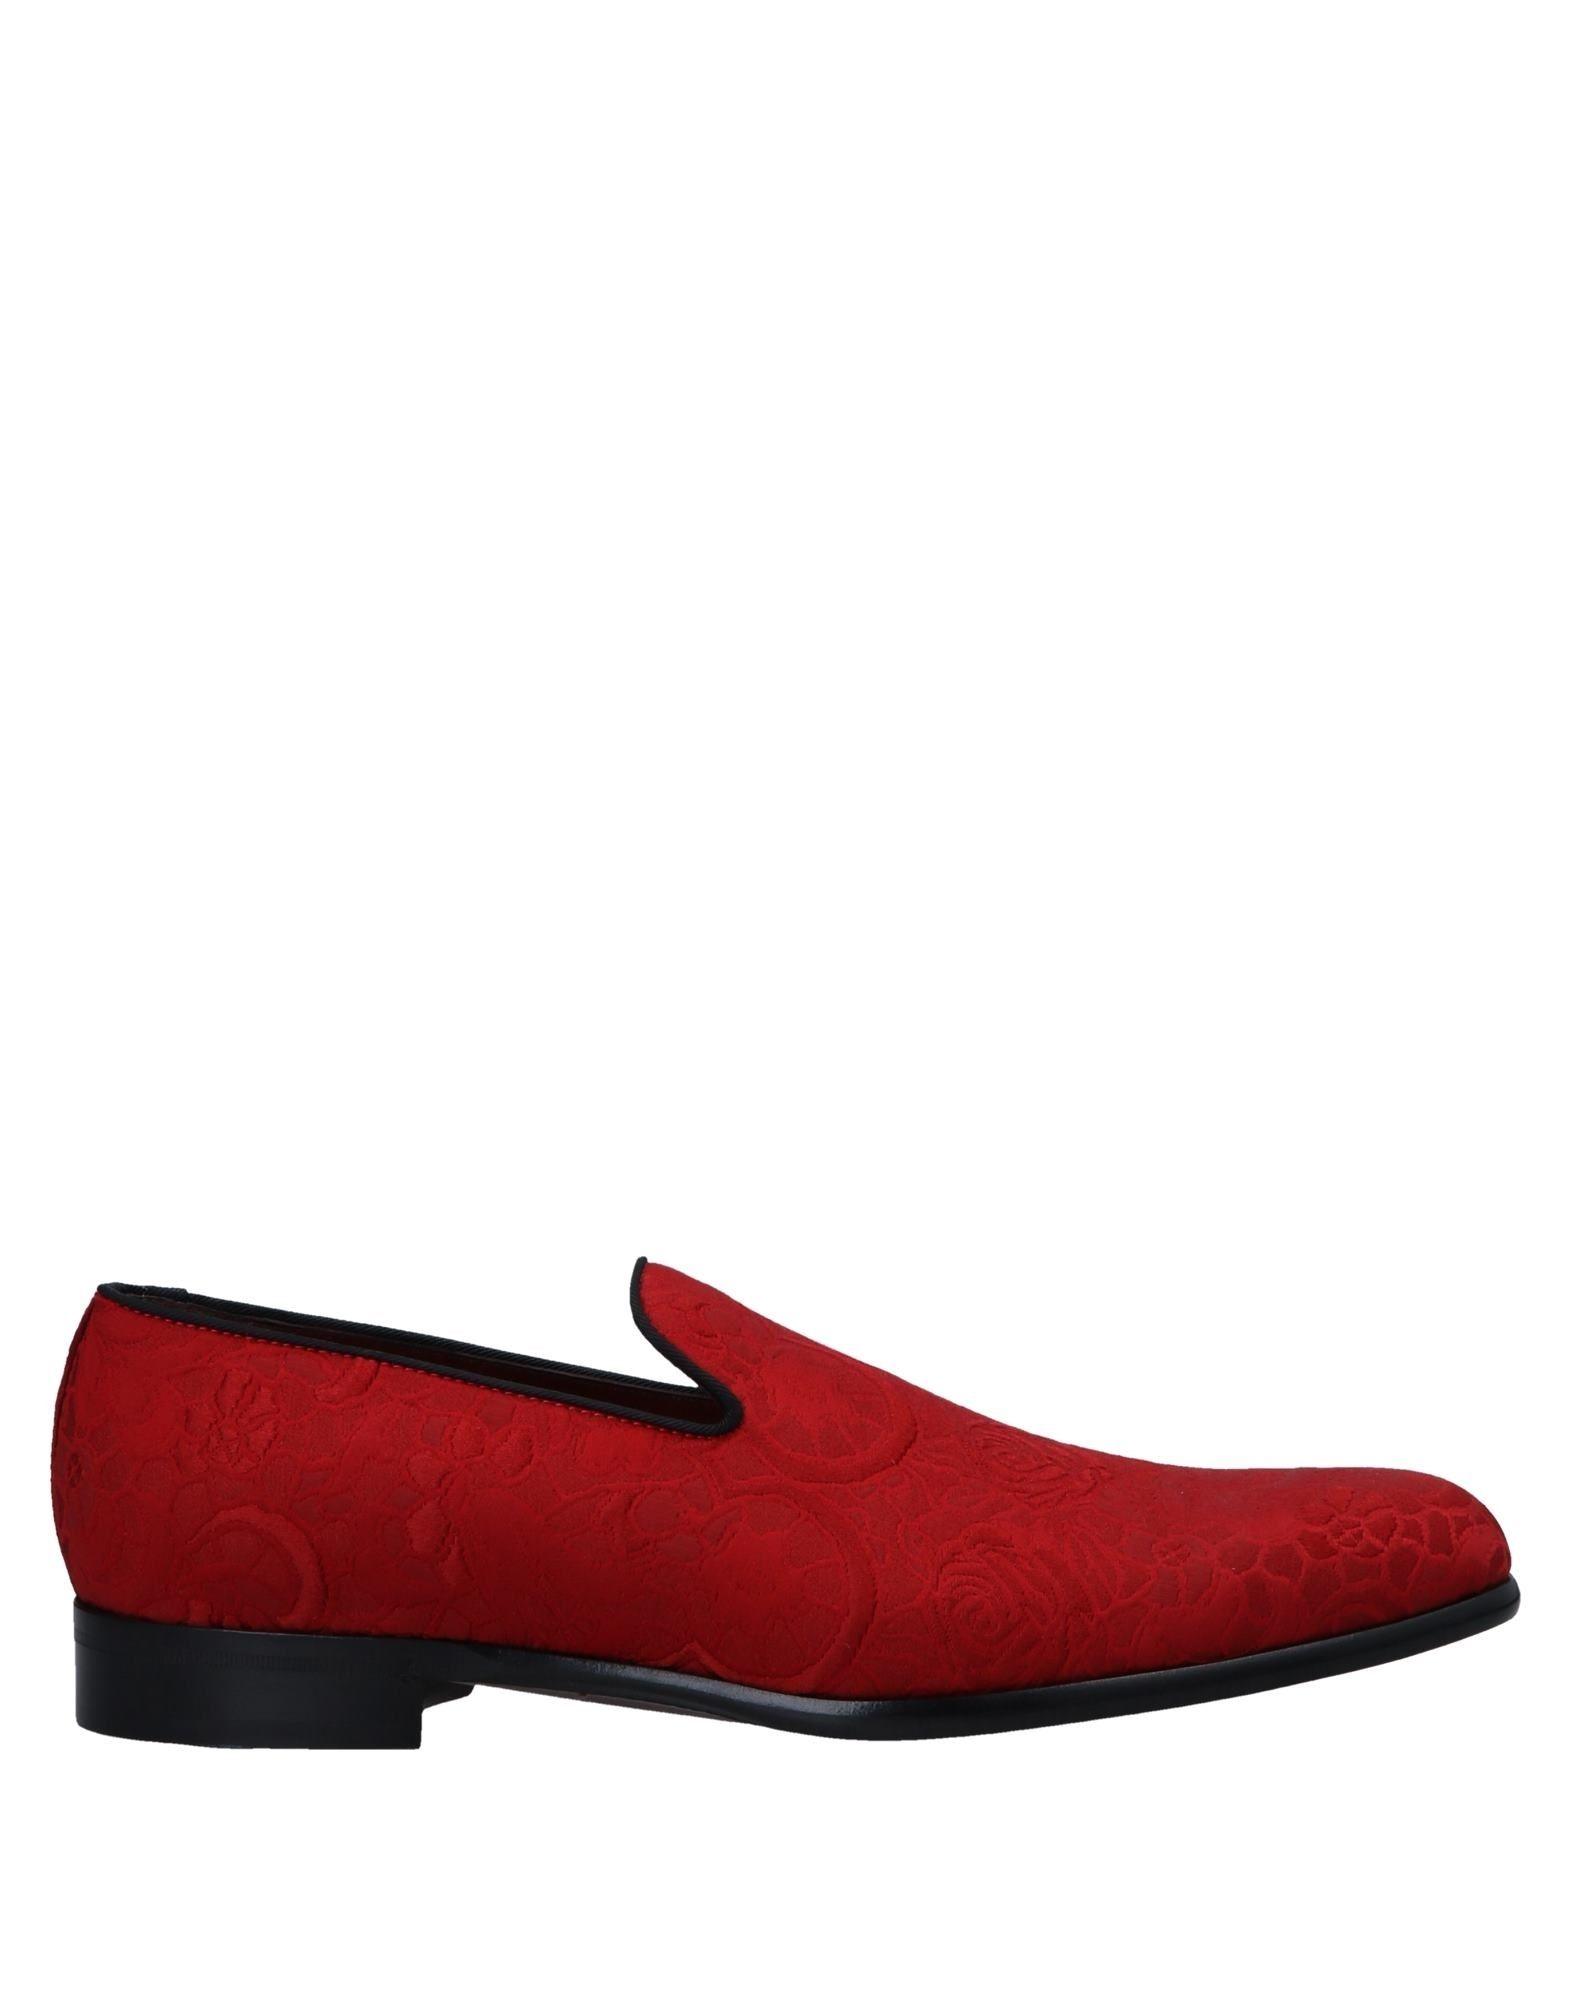 Dolce & Gabbana Loafers - Men online Dolce & Gabbana Loafers online Men on  United Kingdom - 11554785FW 4ebbcd